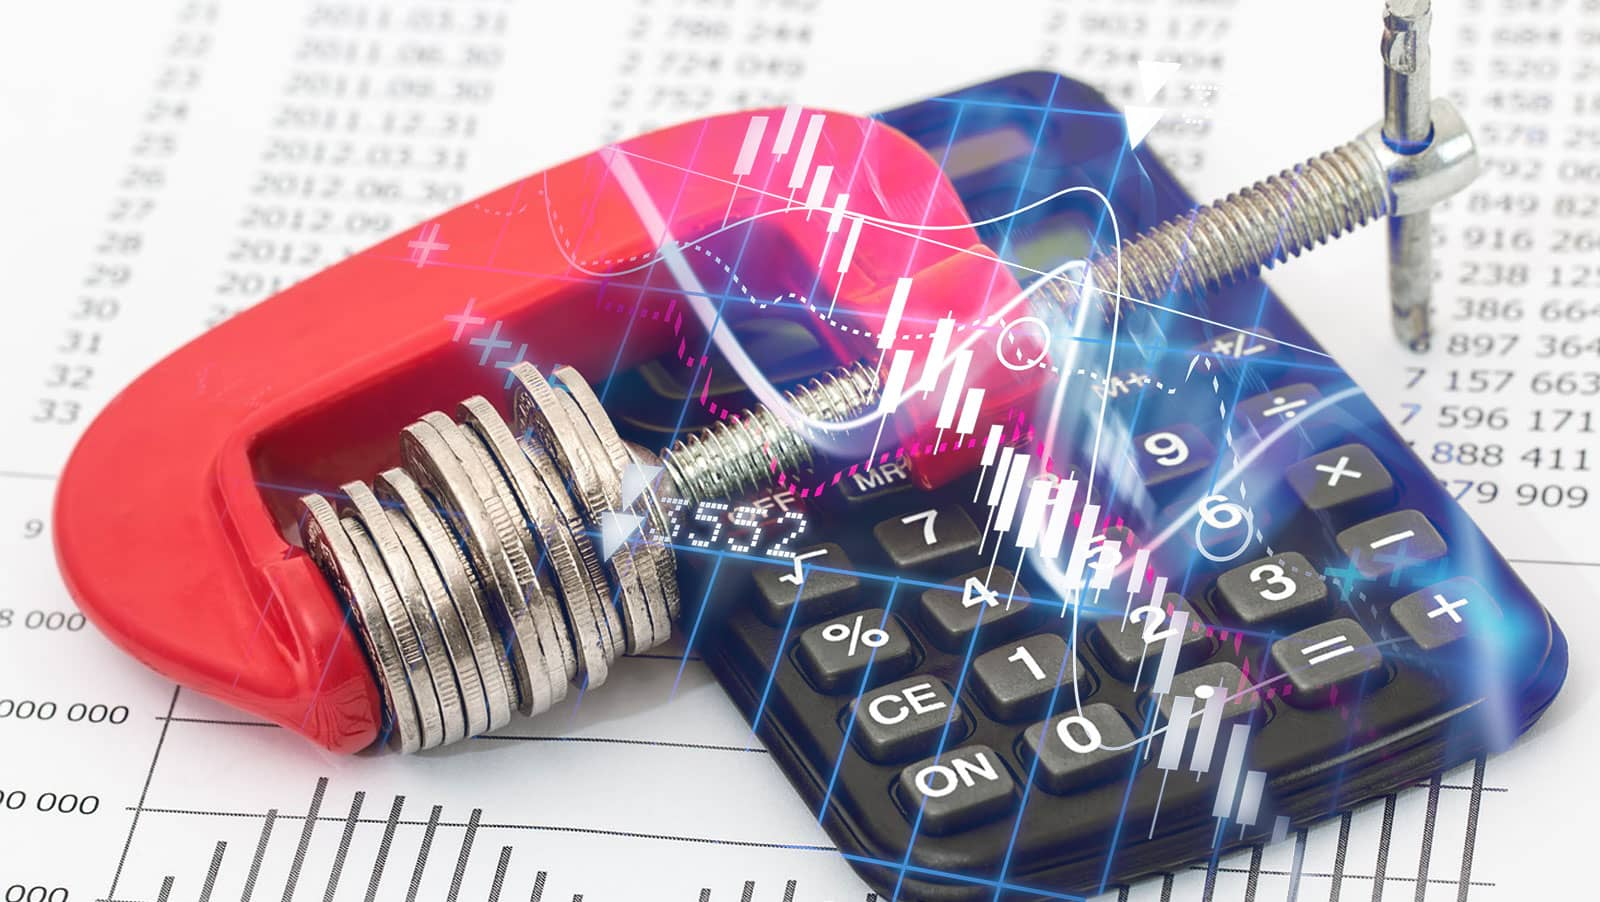 higher-finance-costs-lower-earnings-per-share-for-tsogo-sun-gaming-min